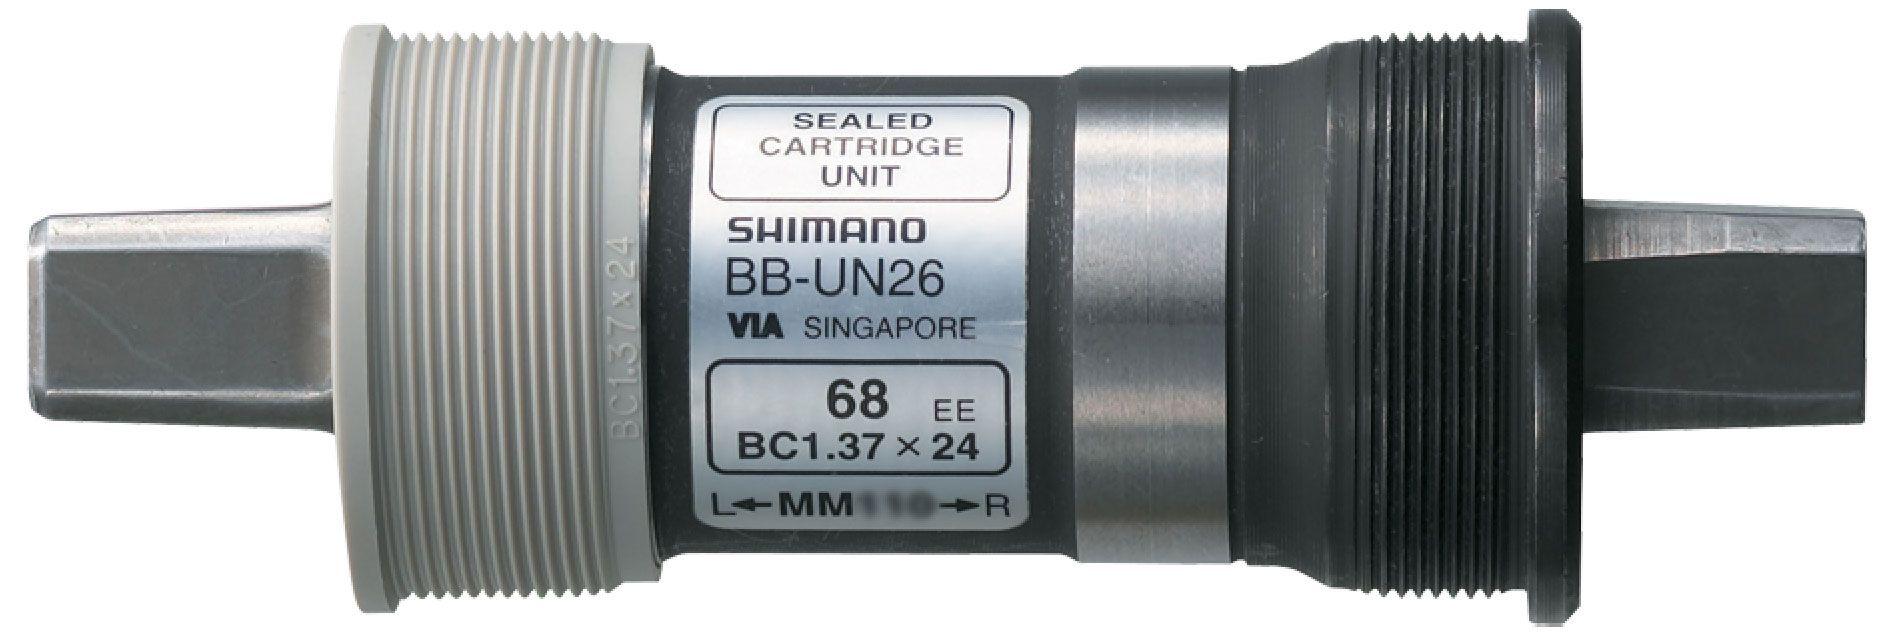 Shimano UN26, 68/122.5(D-NL)